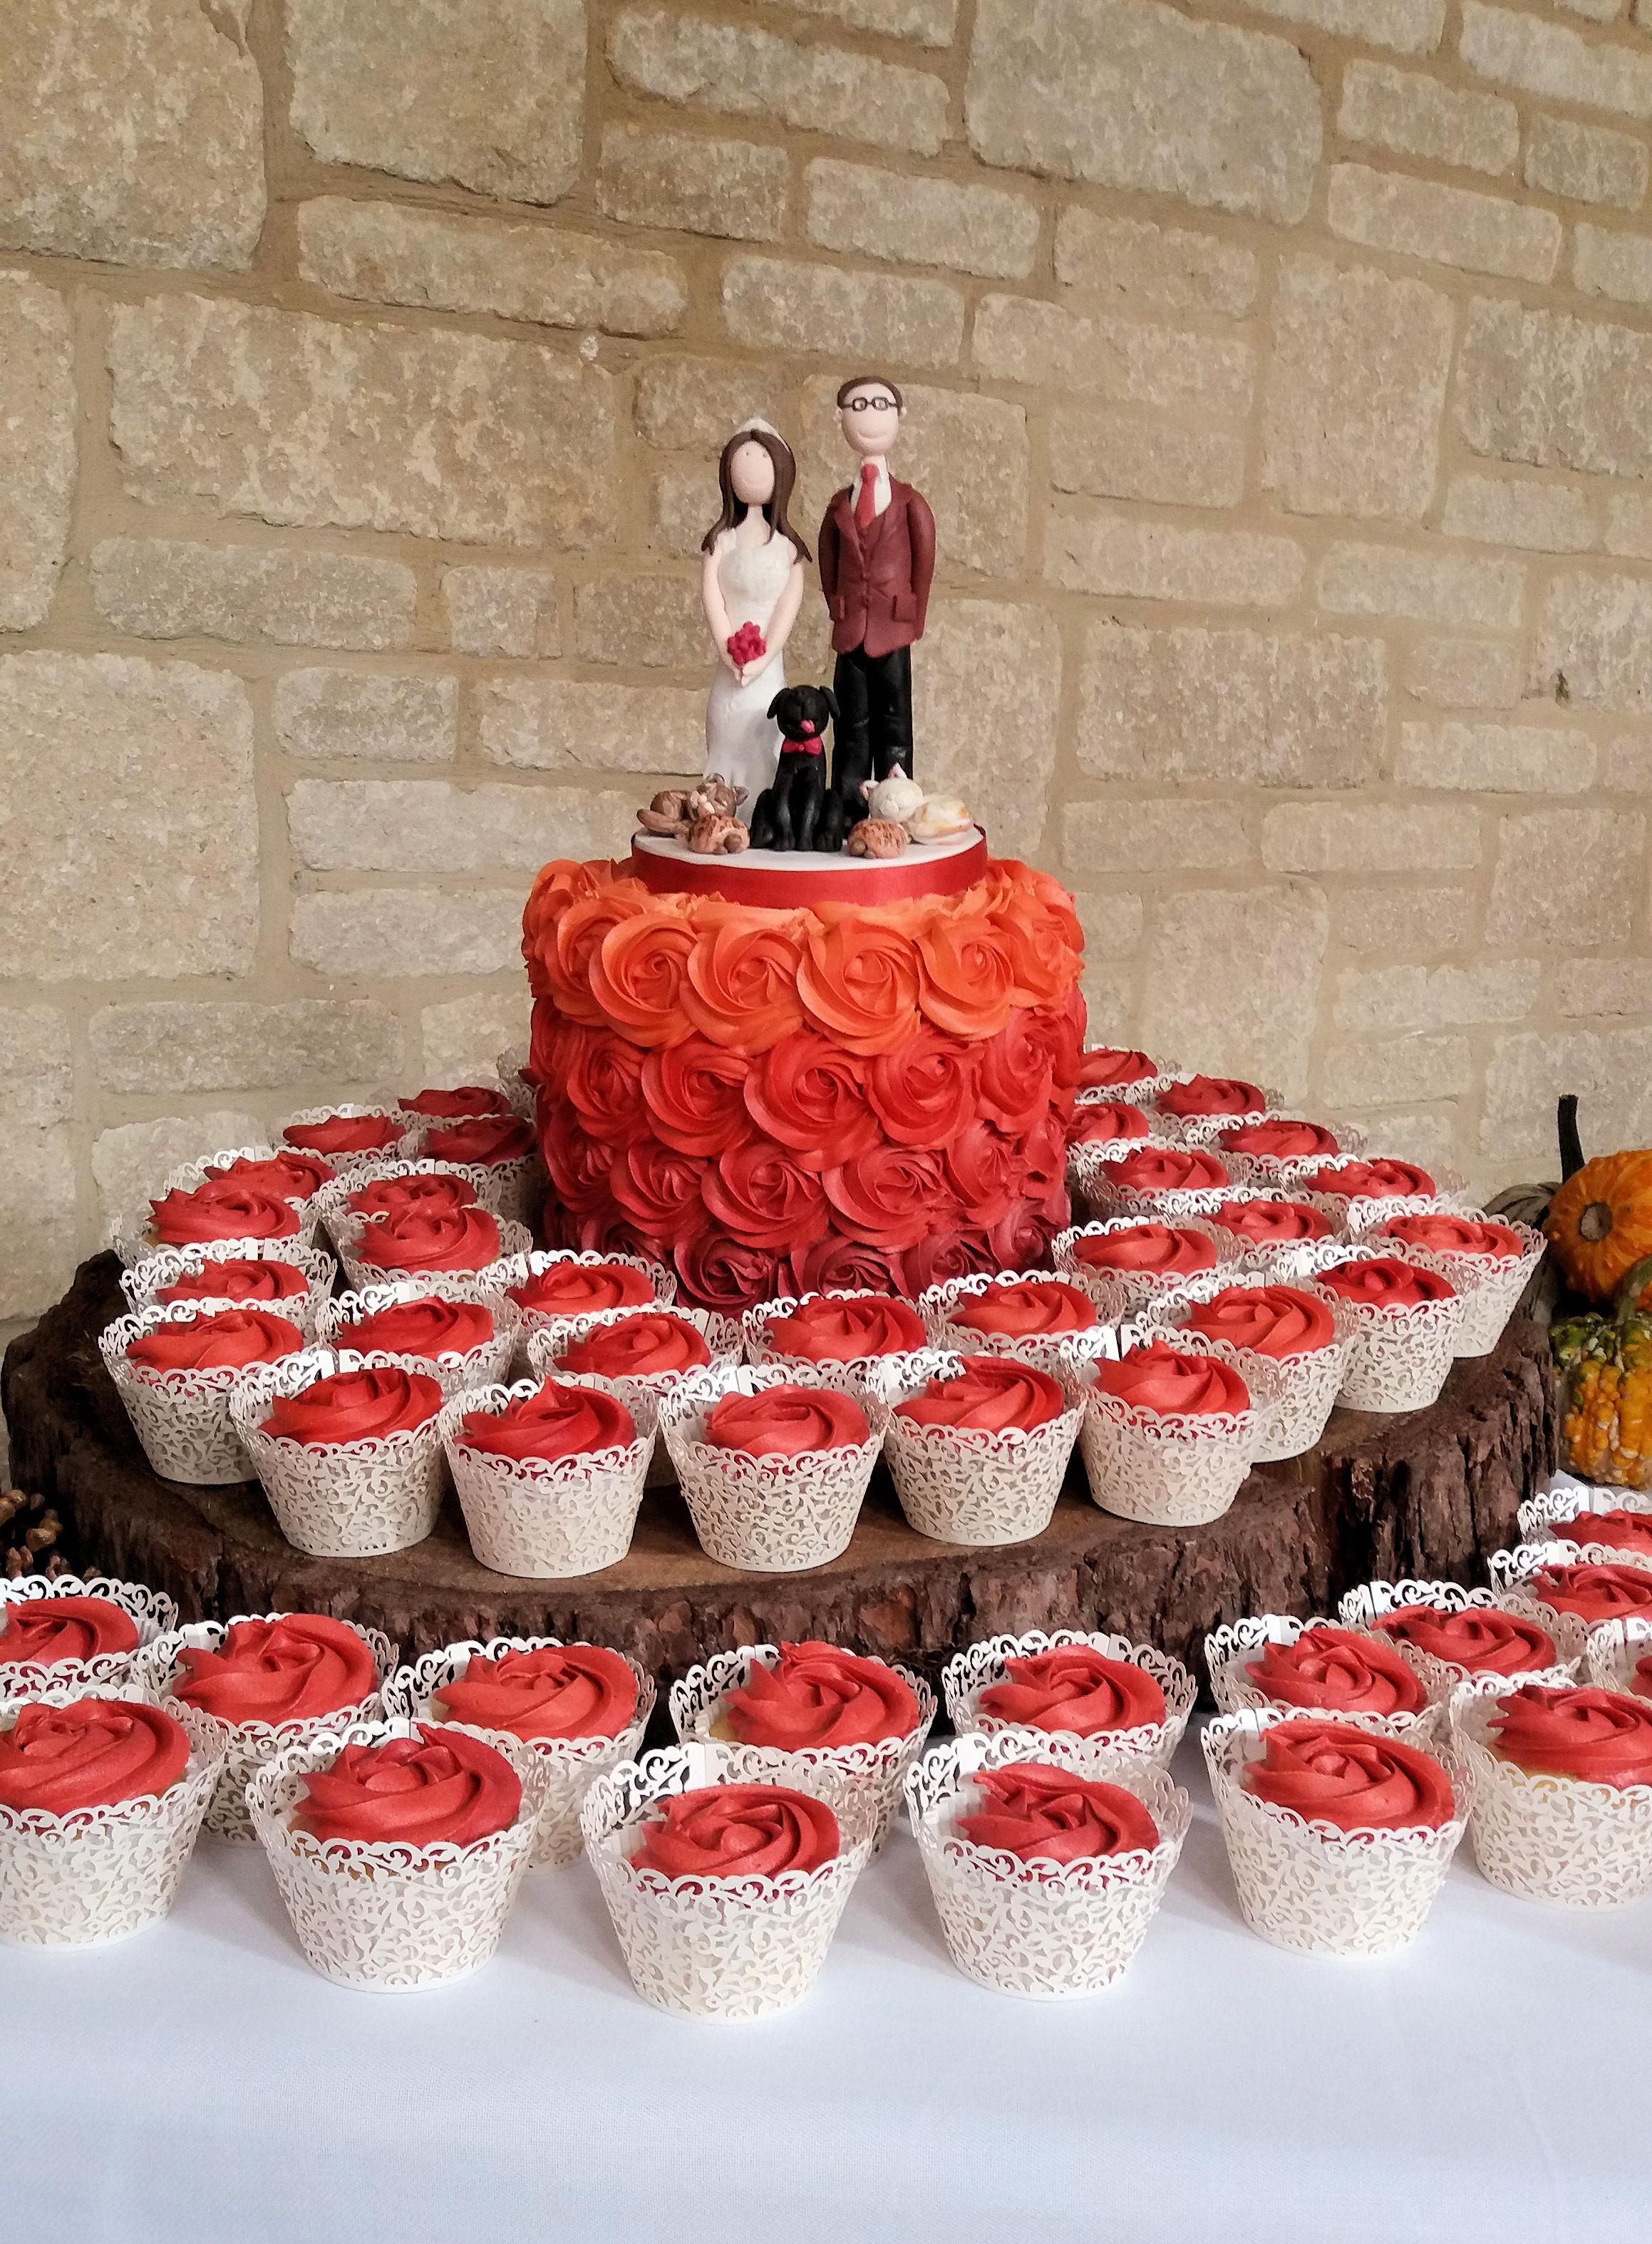 Ombre Rose Wedding Cake & Cupcakes1.jpg